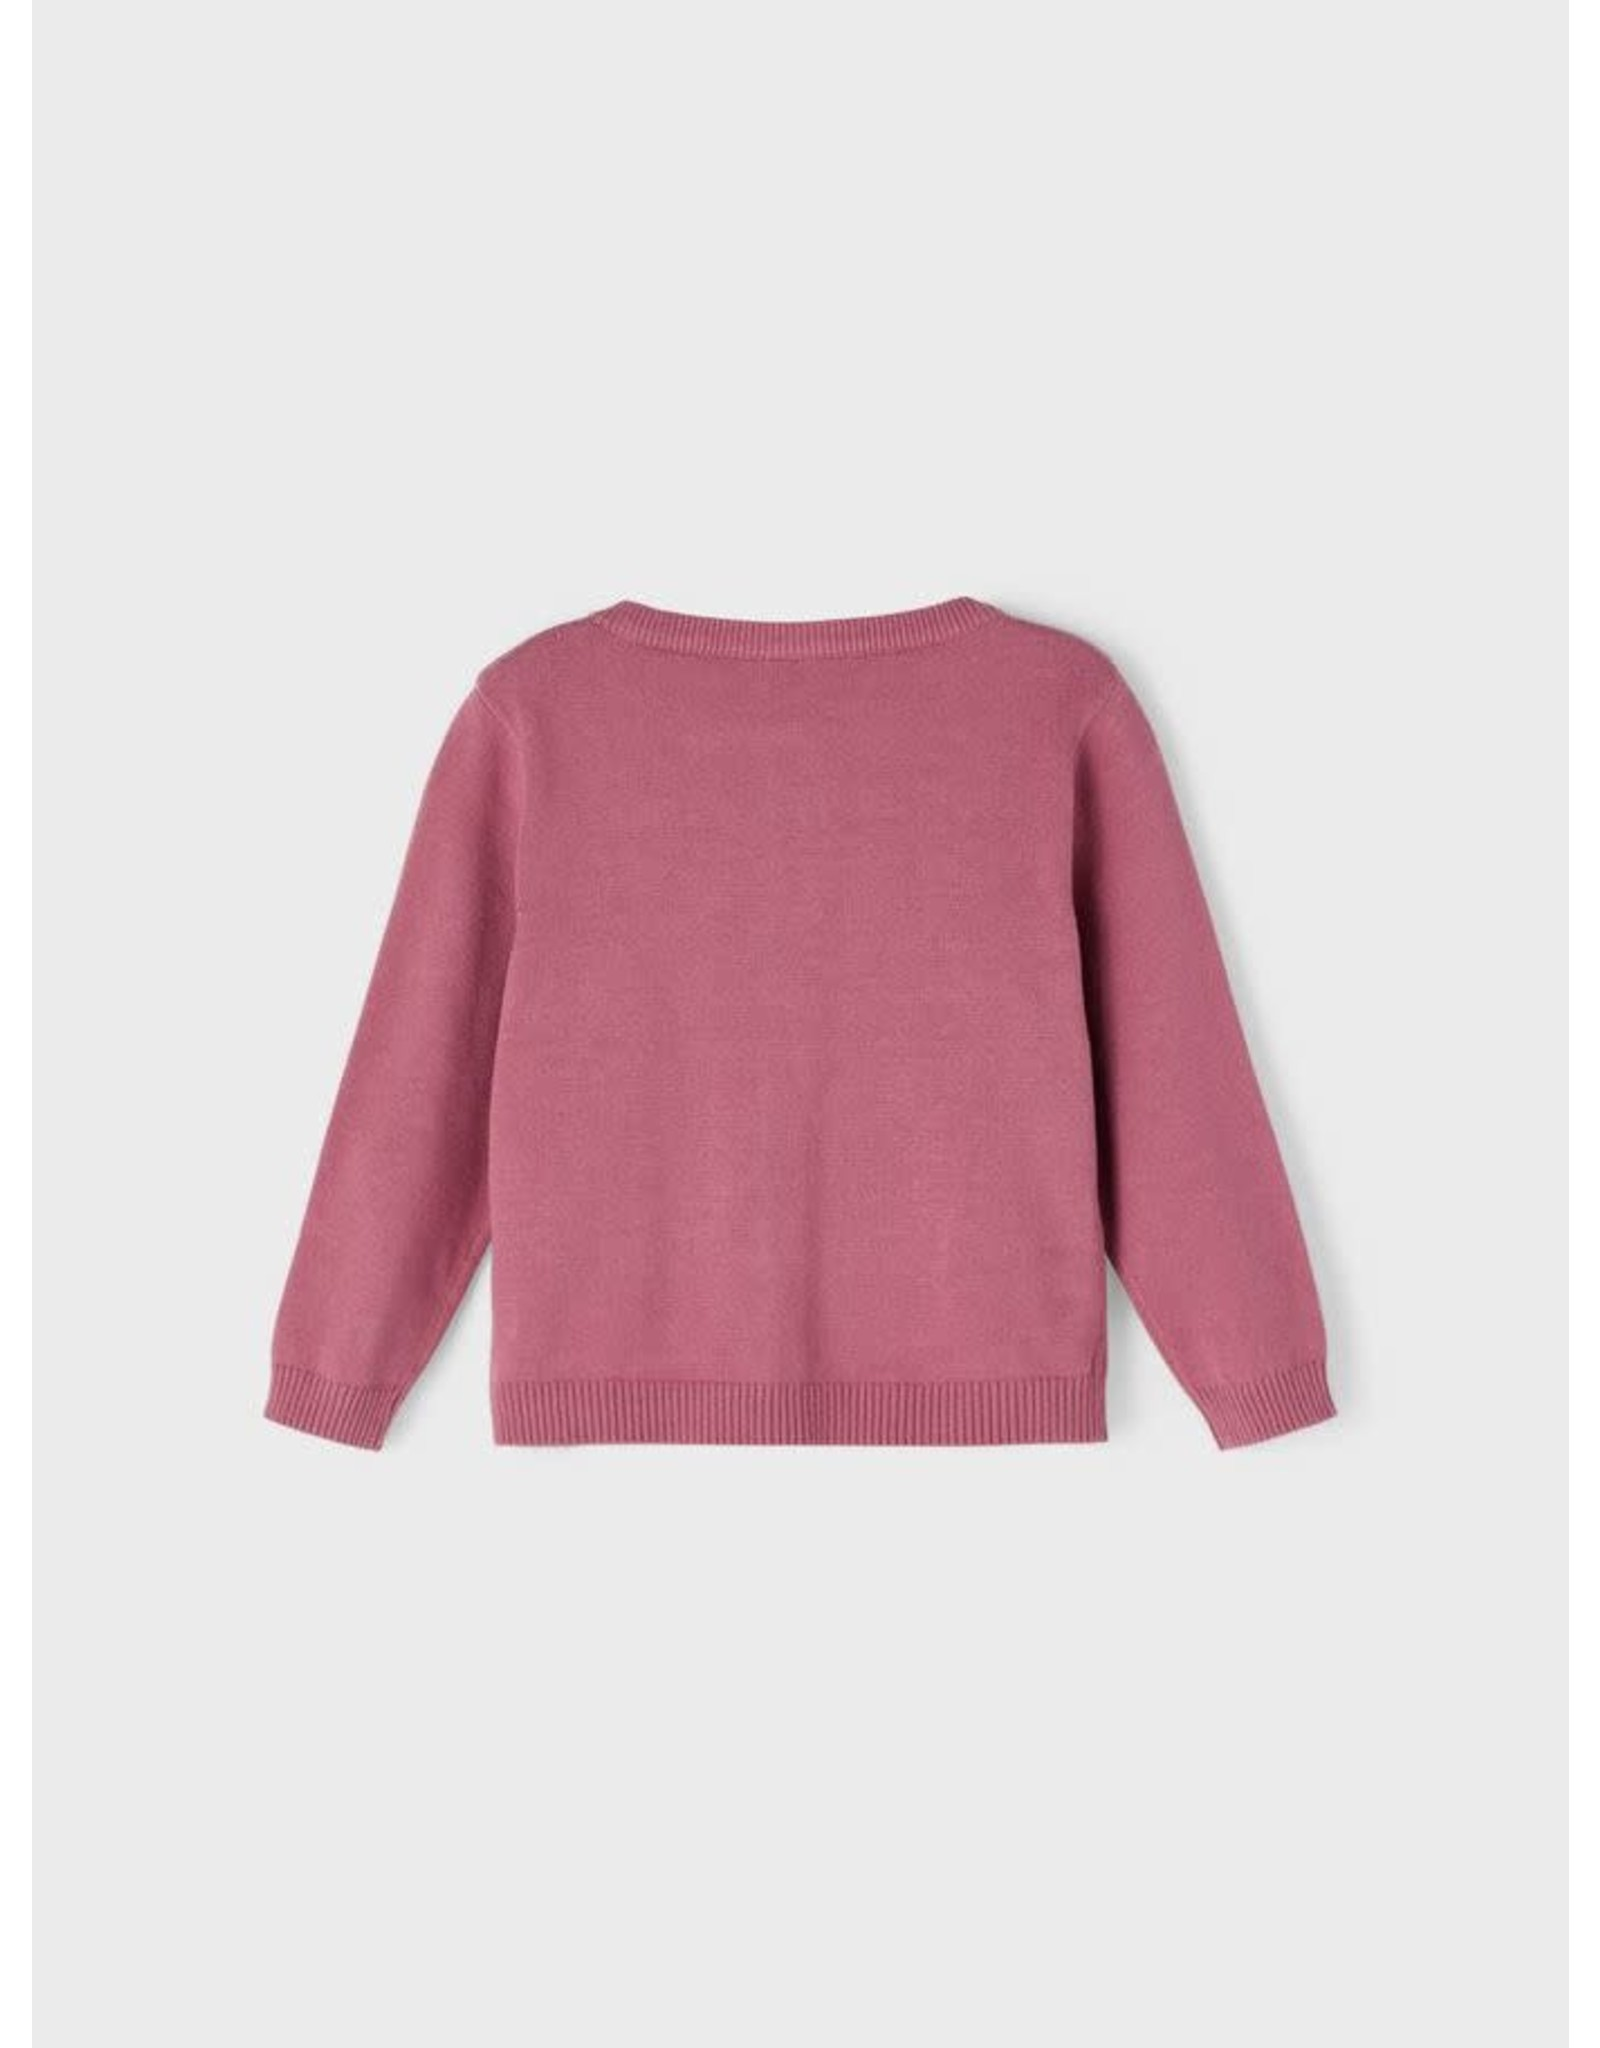 Name It Roze vestje met ruches